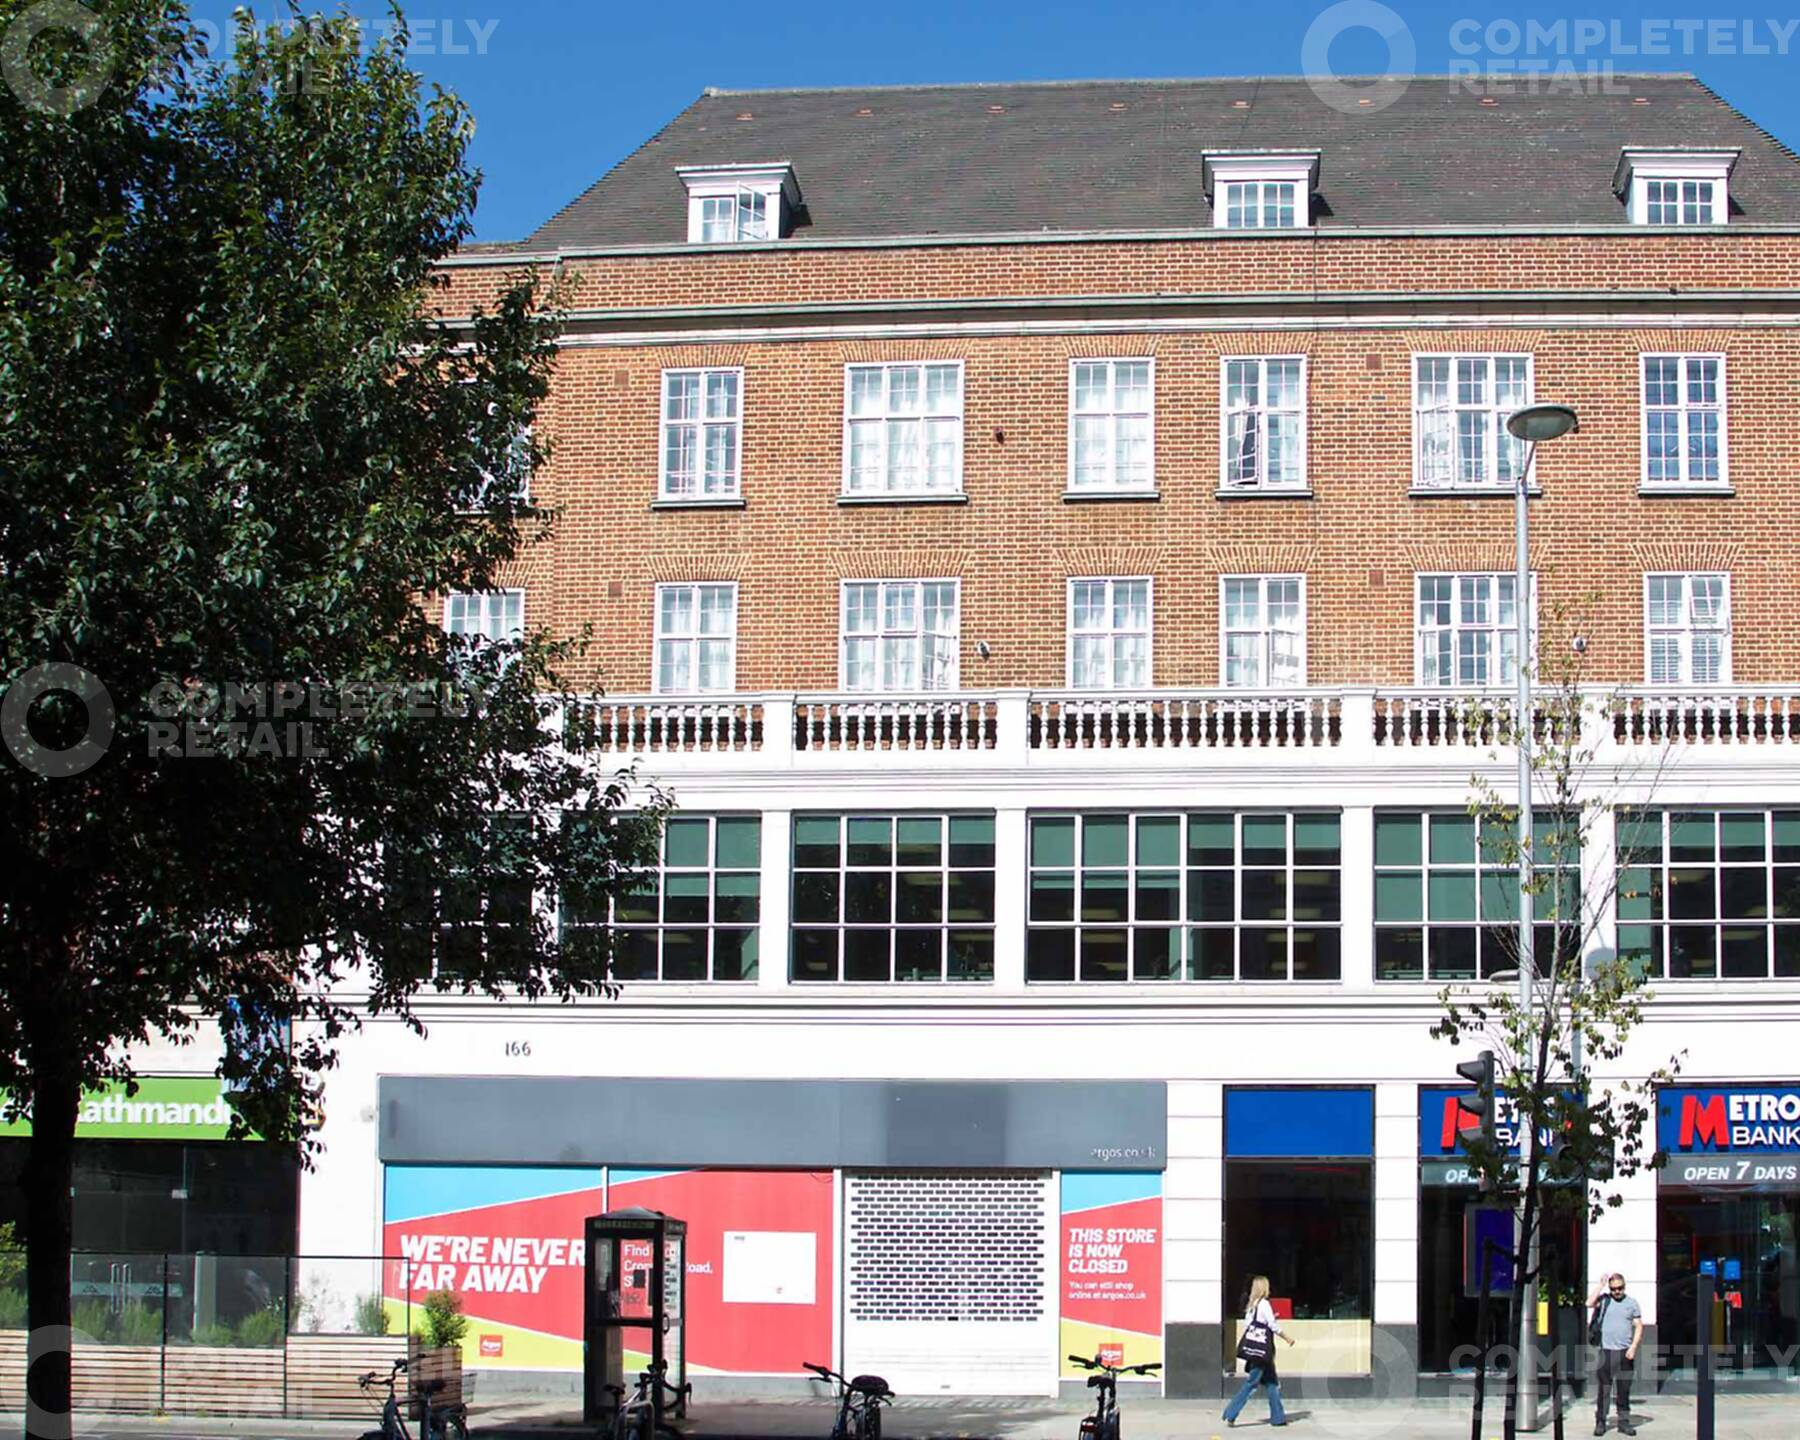 166 Kensington Street